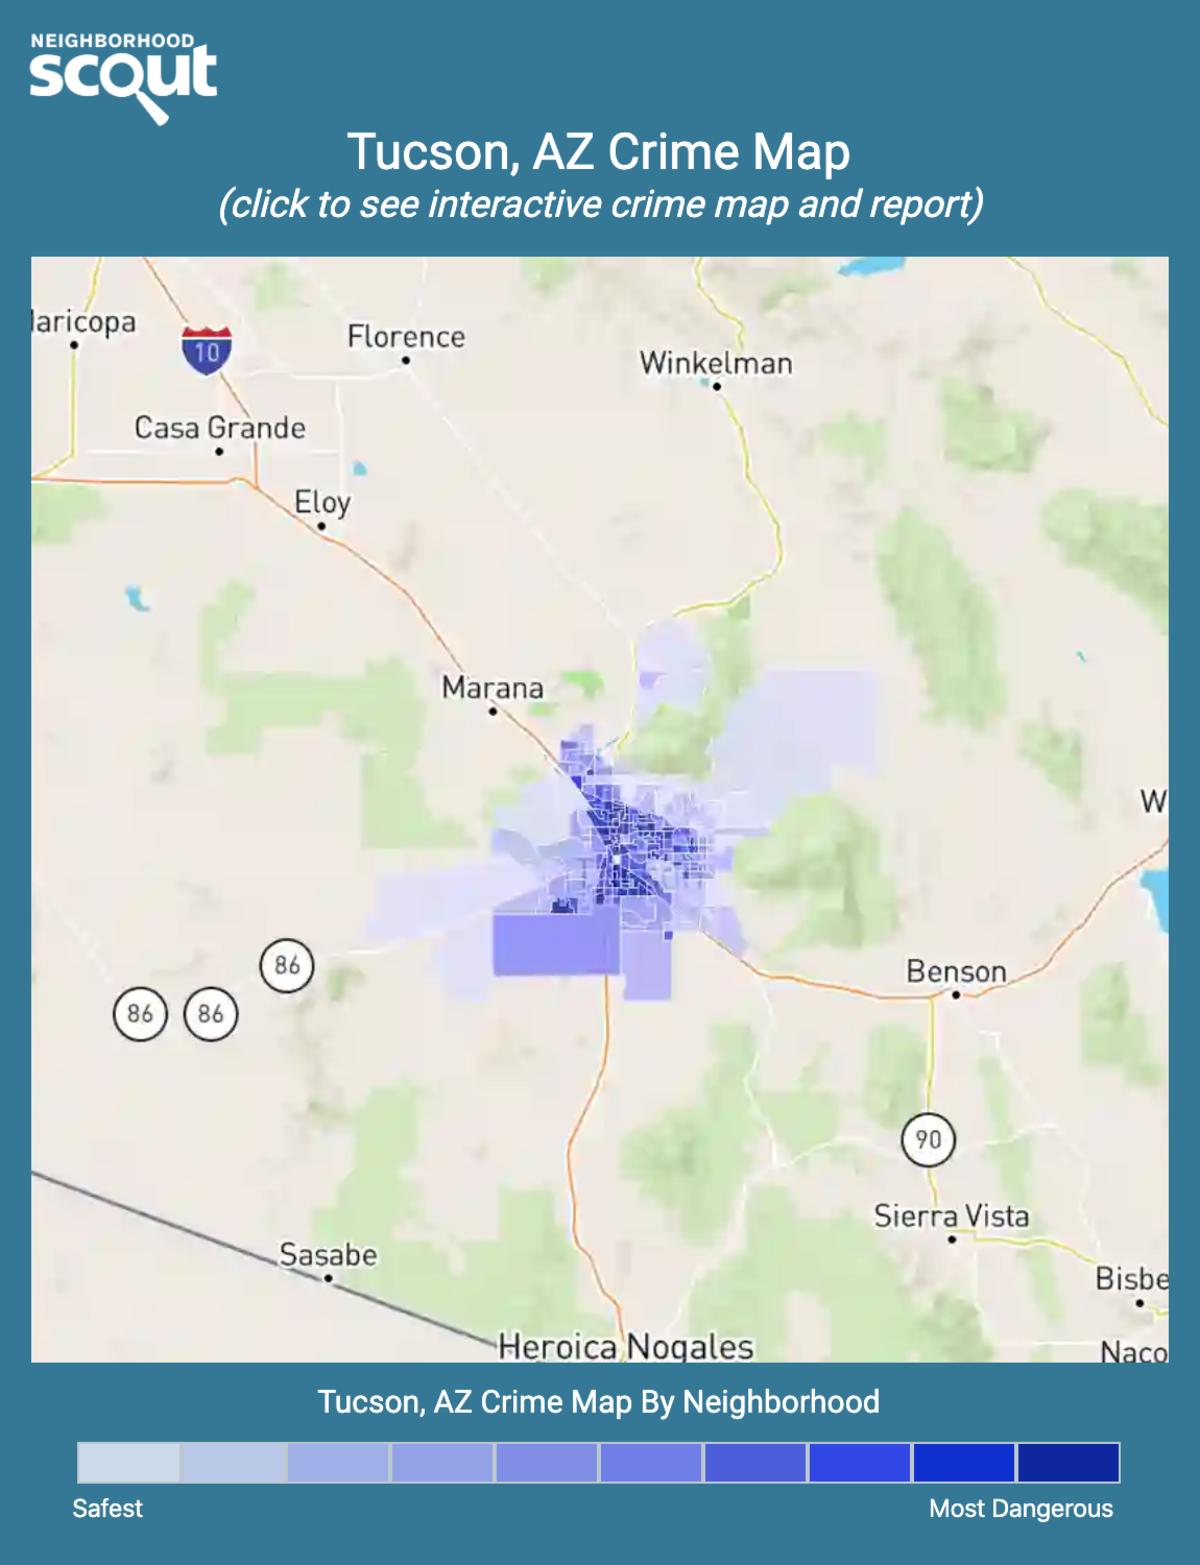 Tucson, Arizona crime map